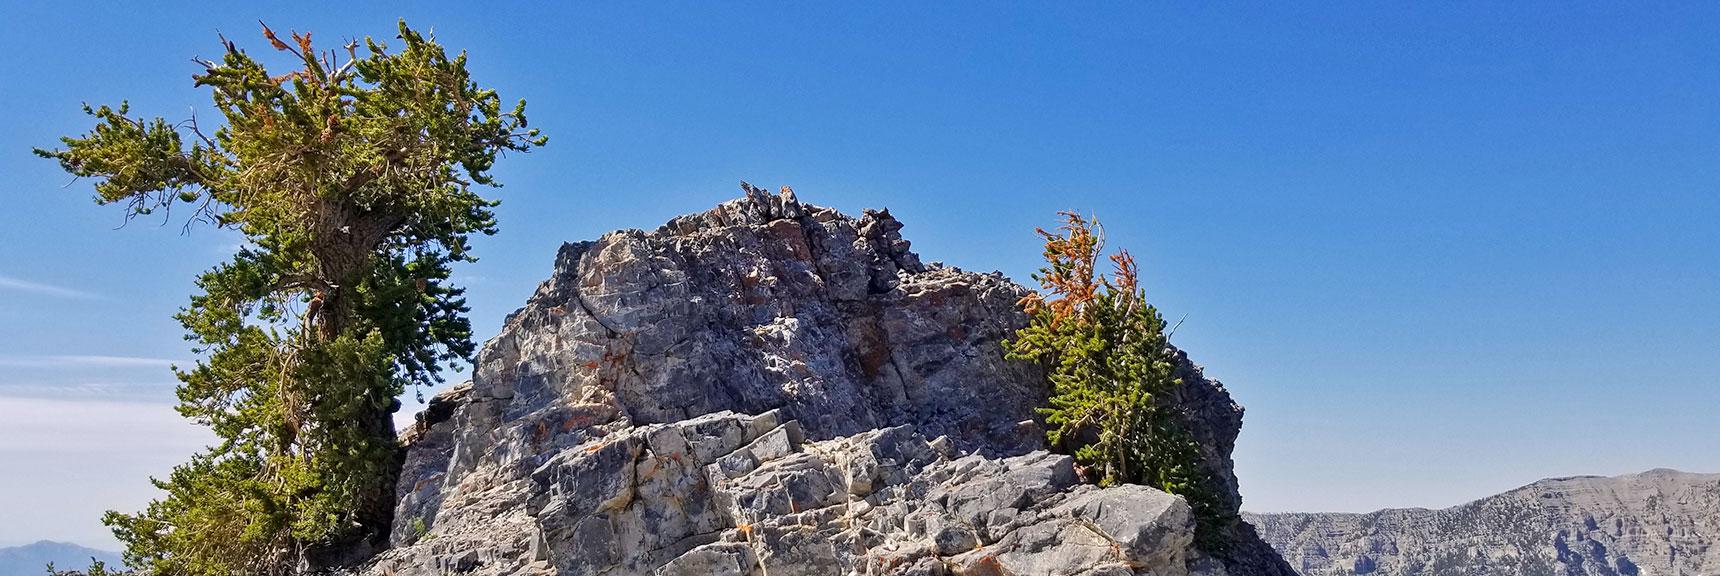 Granite Height on Mummy's Knees | Mummy Mountain's Knees | Mt. Charleston Wilderness, Nevada 020